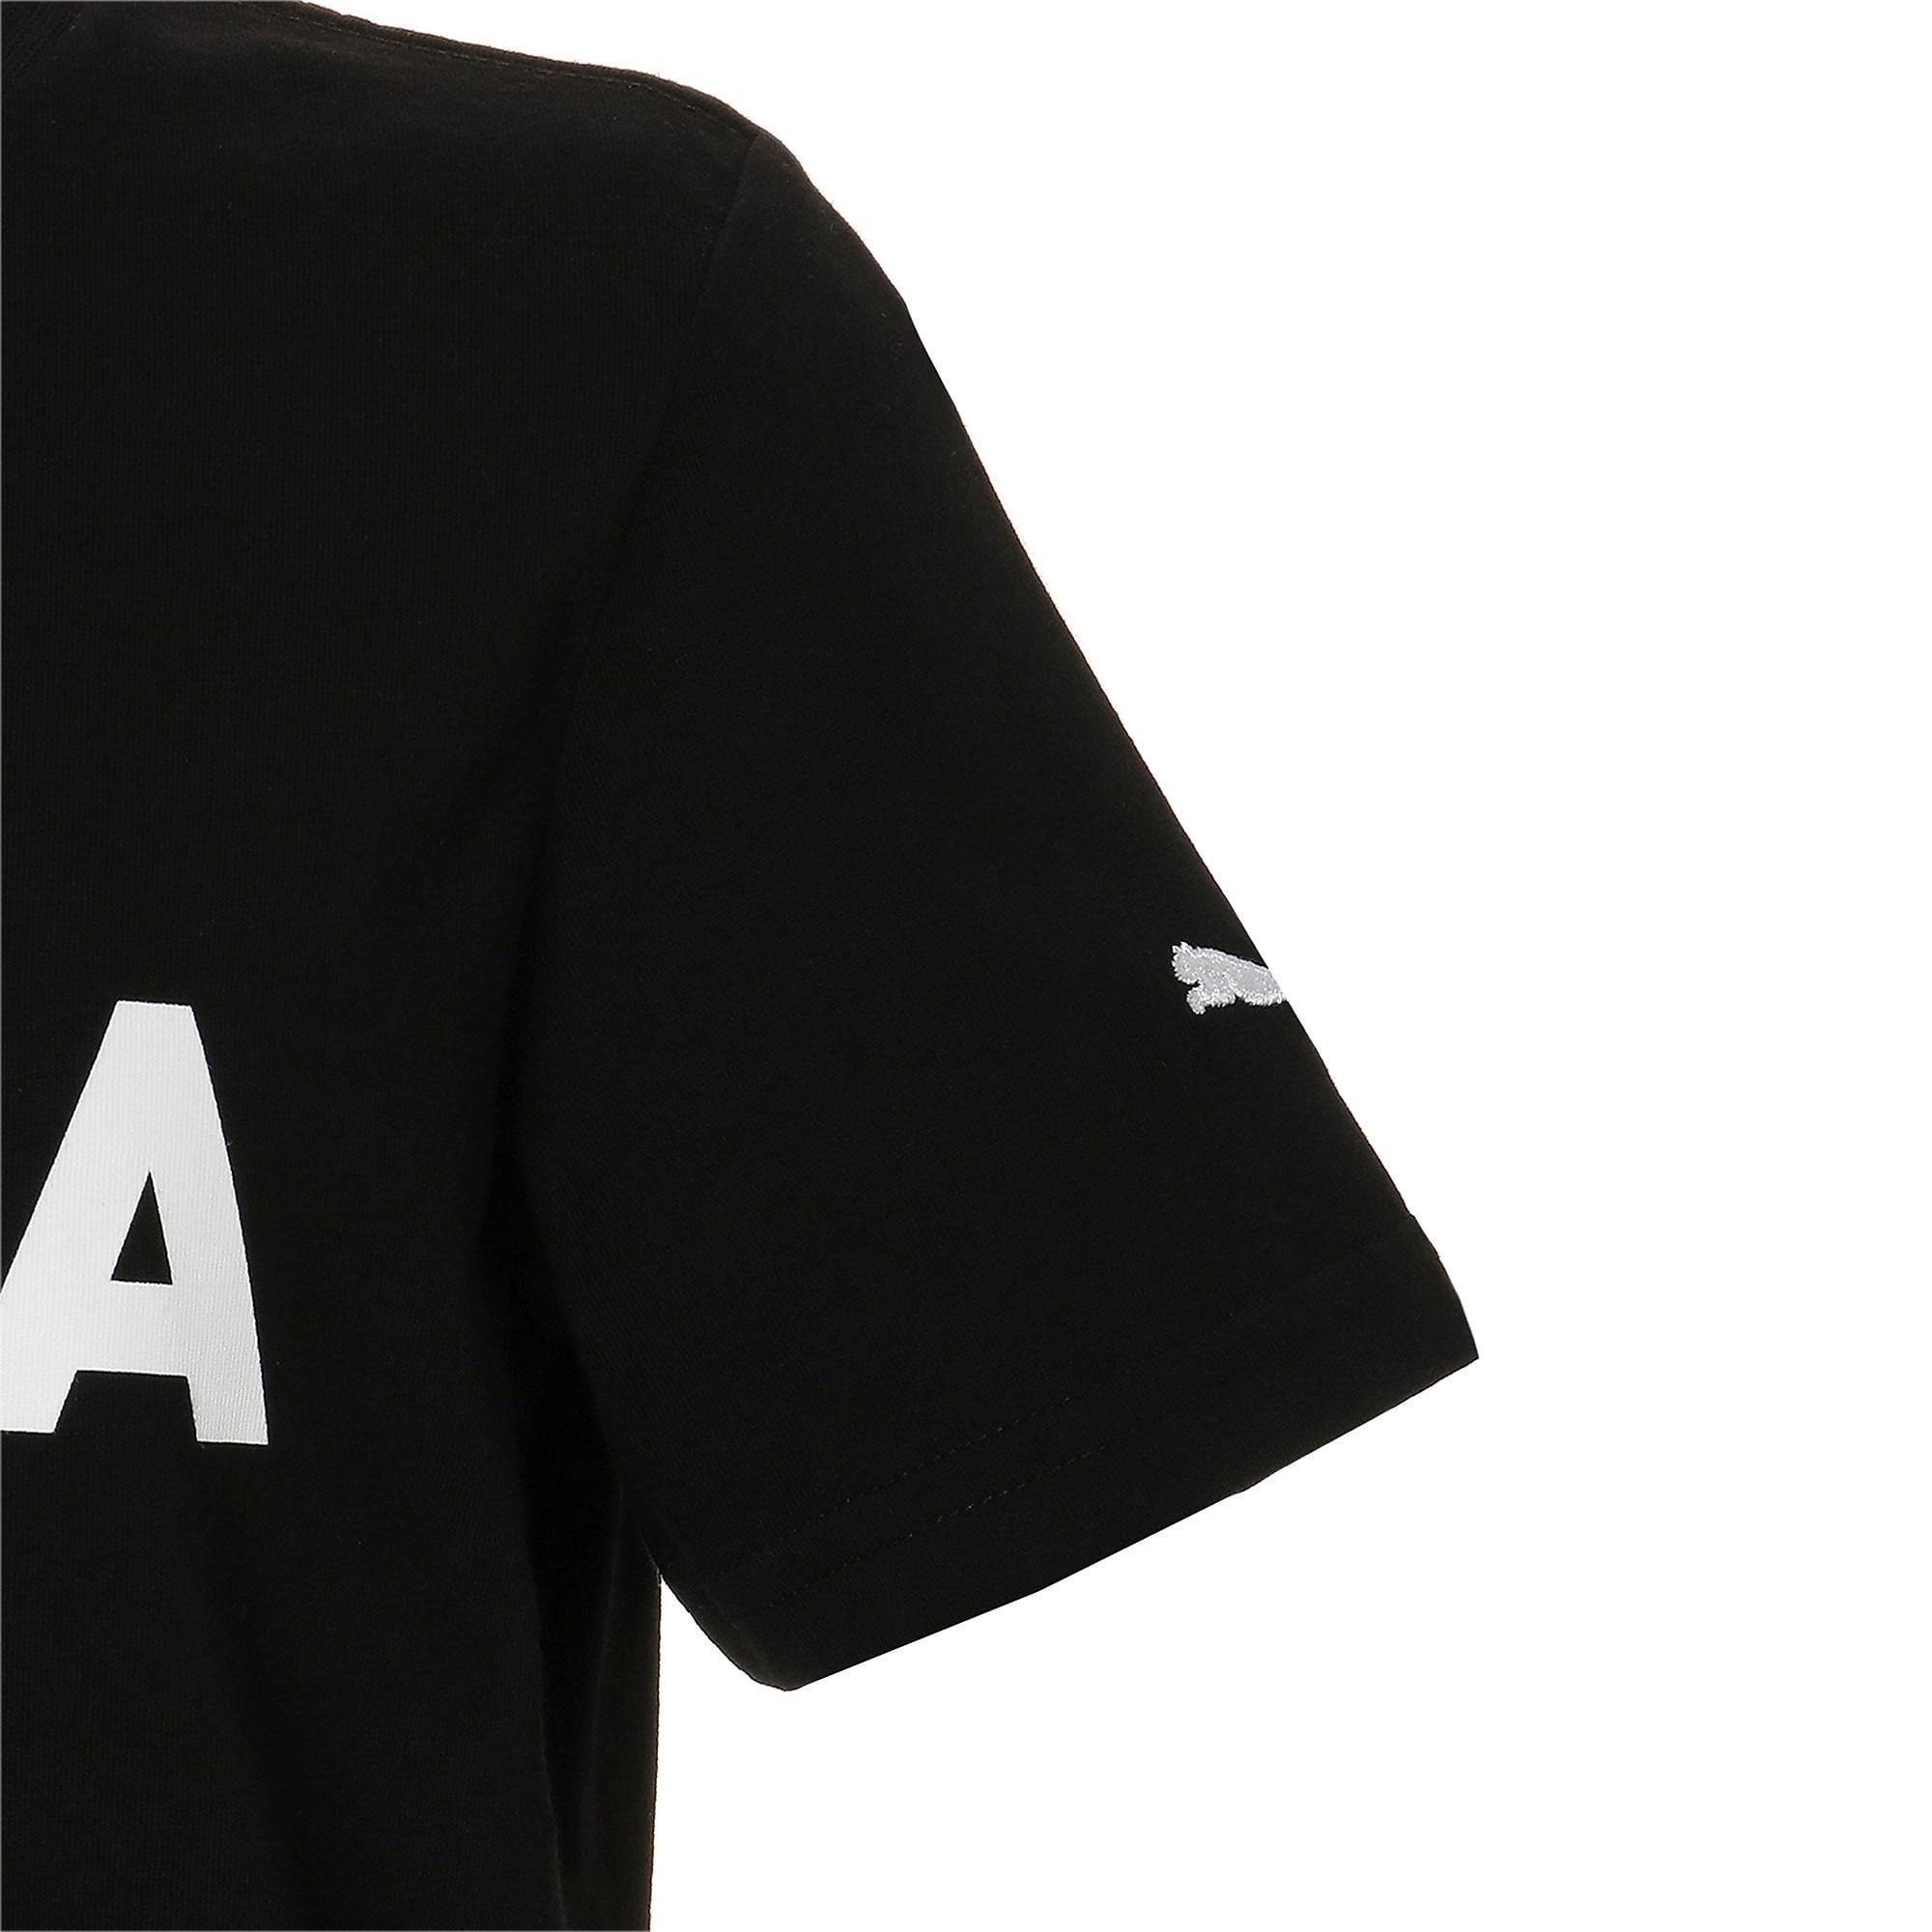 Thumbnail 5 of キッズ シティー 半袖 Tシャツ 2 OSAKA 大阪, Puma Black, medium-JPN